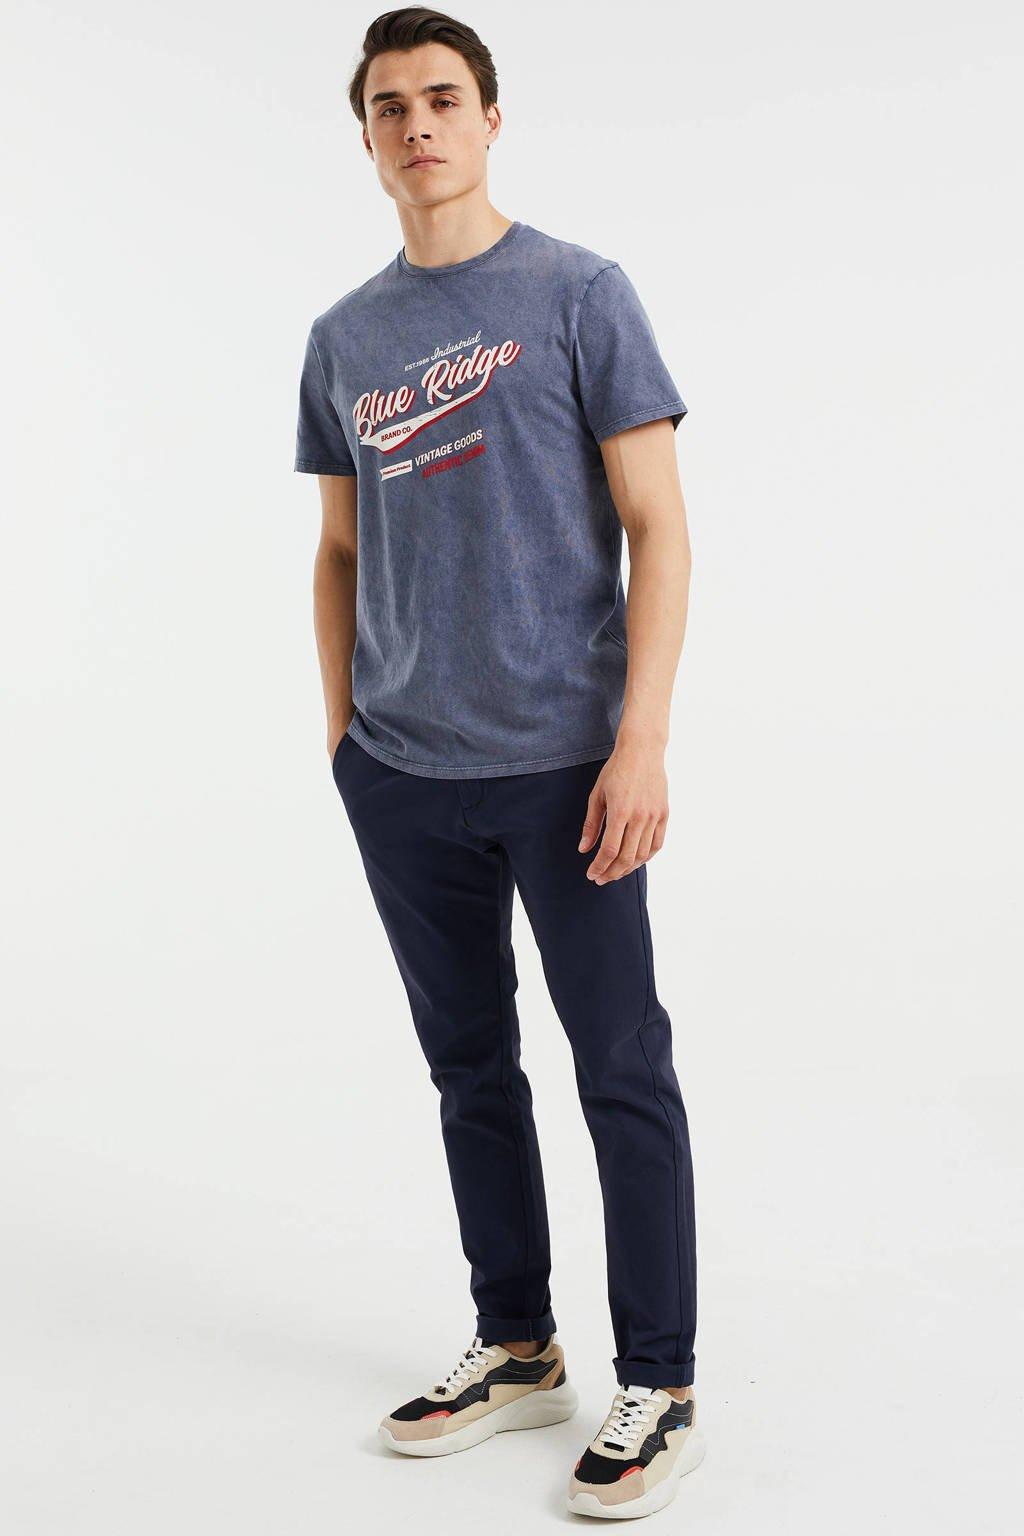 WE Fashion Blue Ridge slim fit T-shirt met printopdruk Heavy Blue